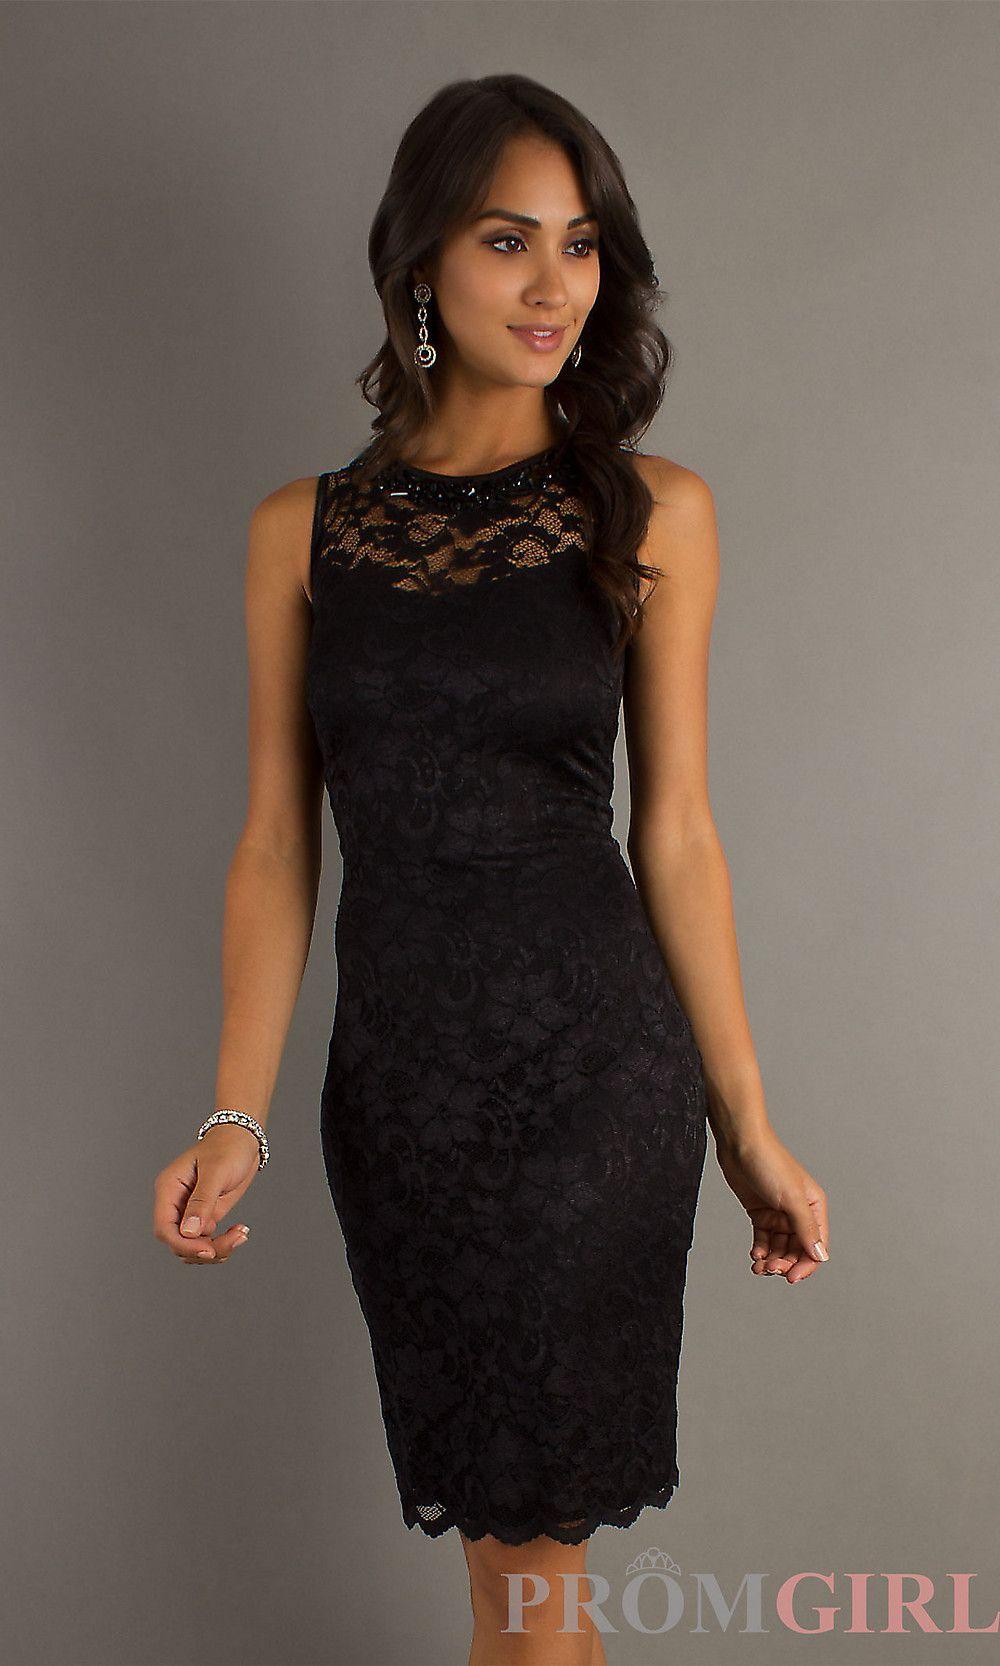 4e1ba3f9b2d form fitting lace dresses - Google Search